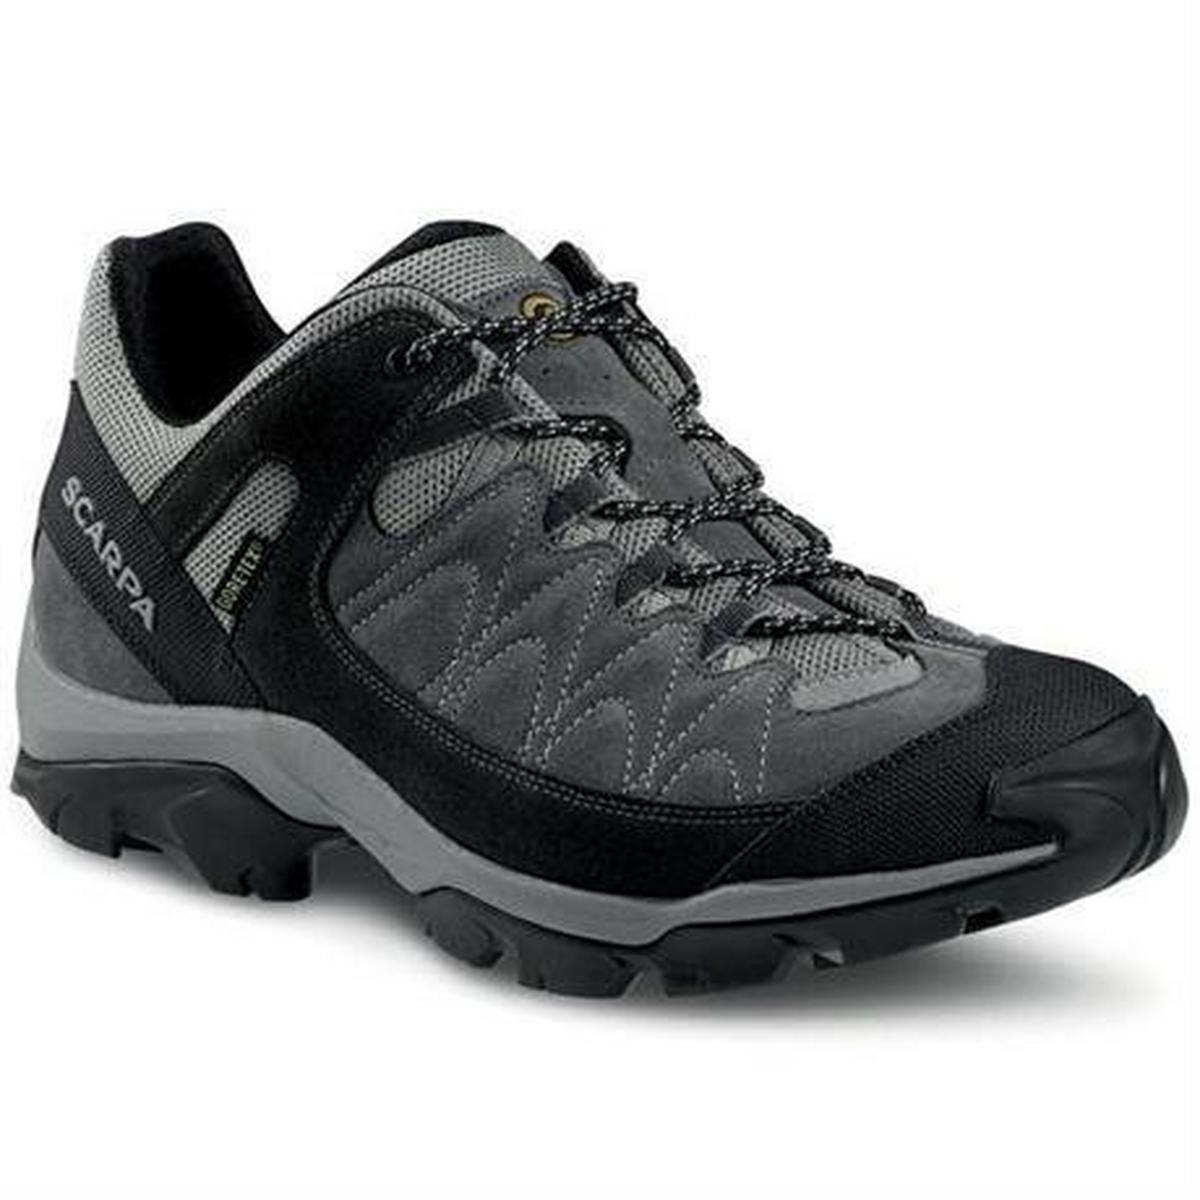 Scarpa Shoes Men's Vortex GTX Anthracite/Smoke